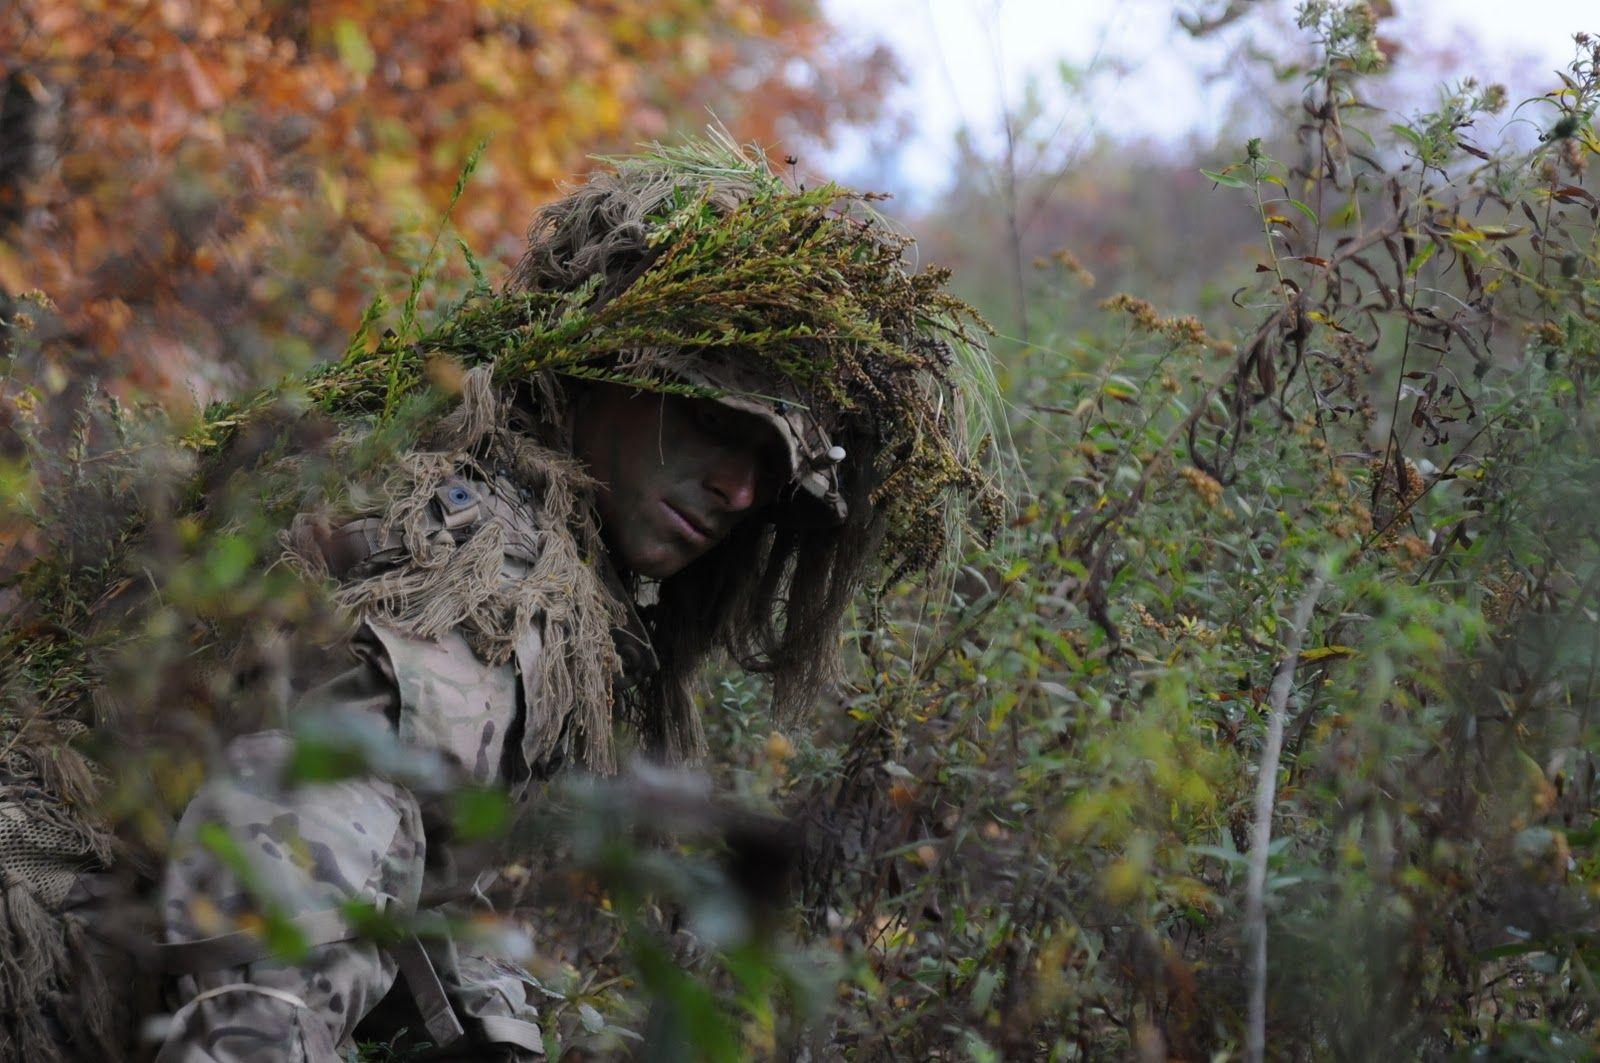 Usmc Scout Sniper Basic Course